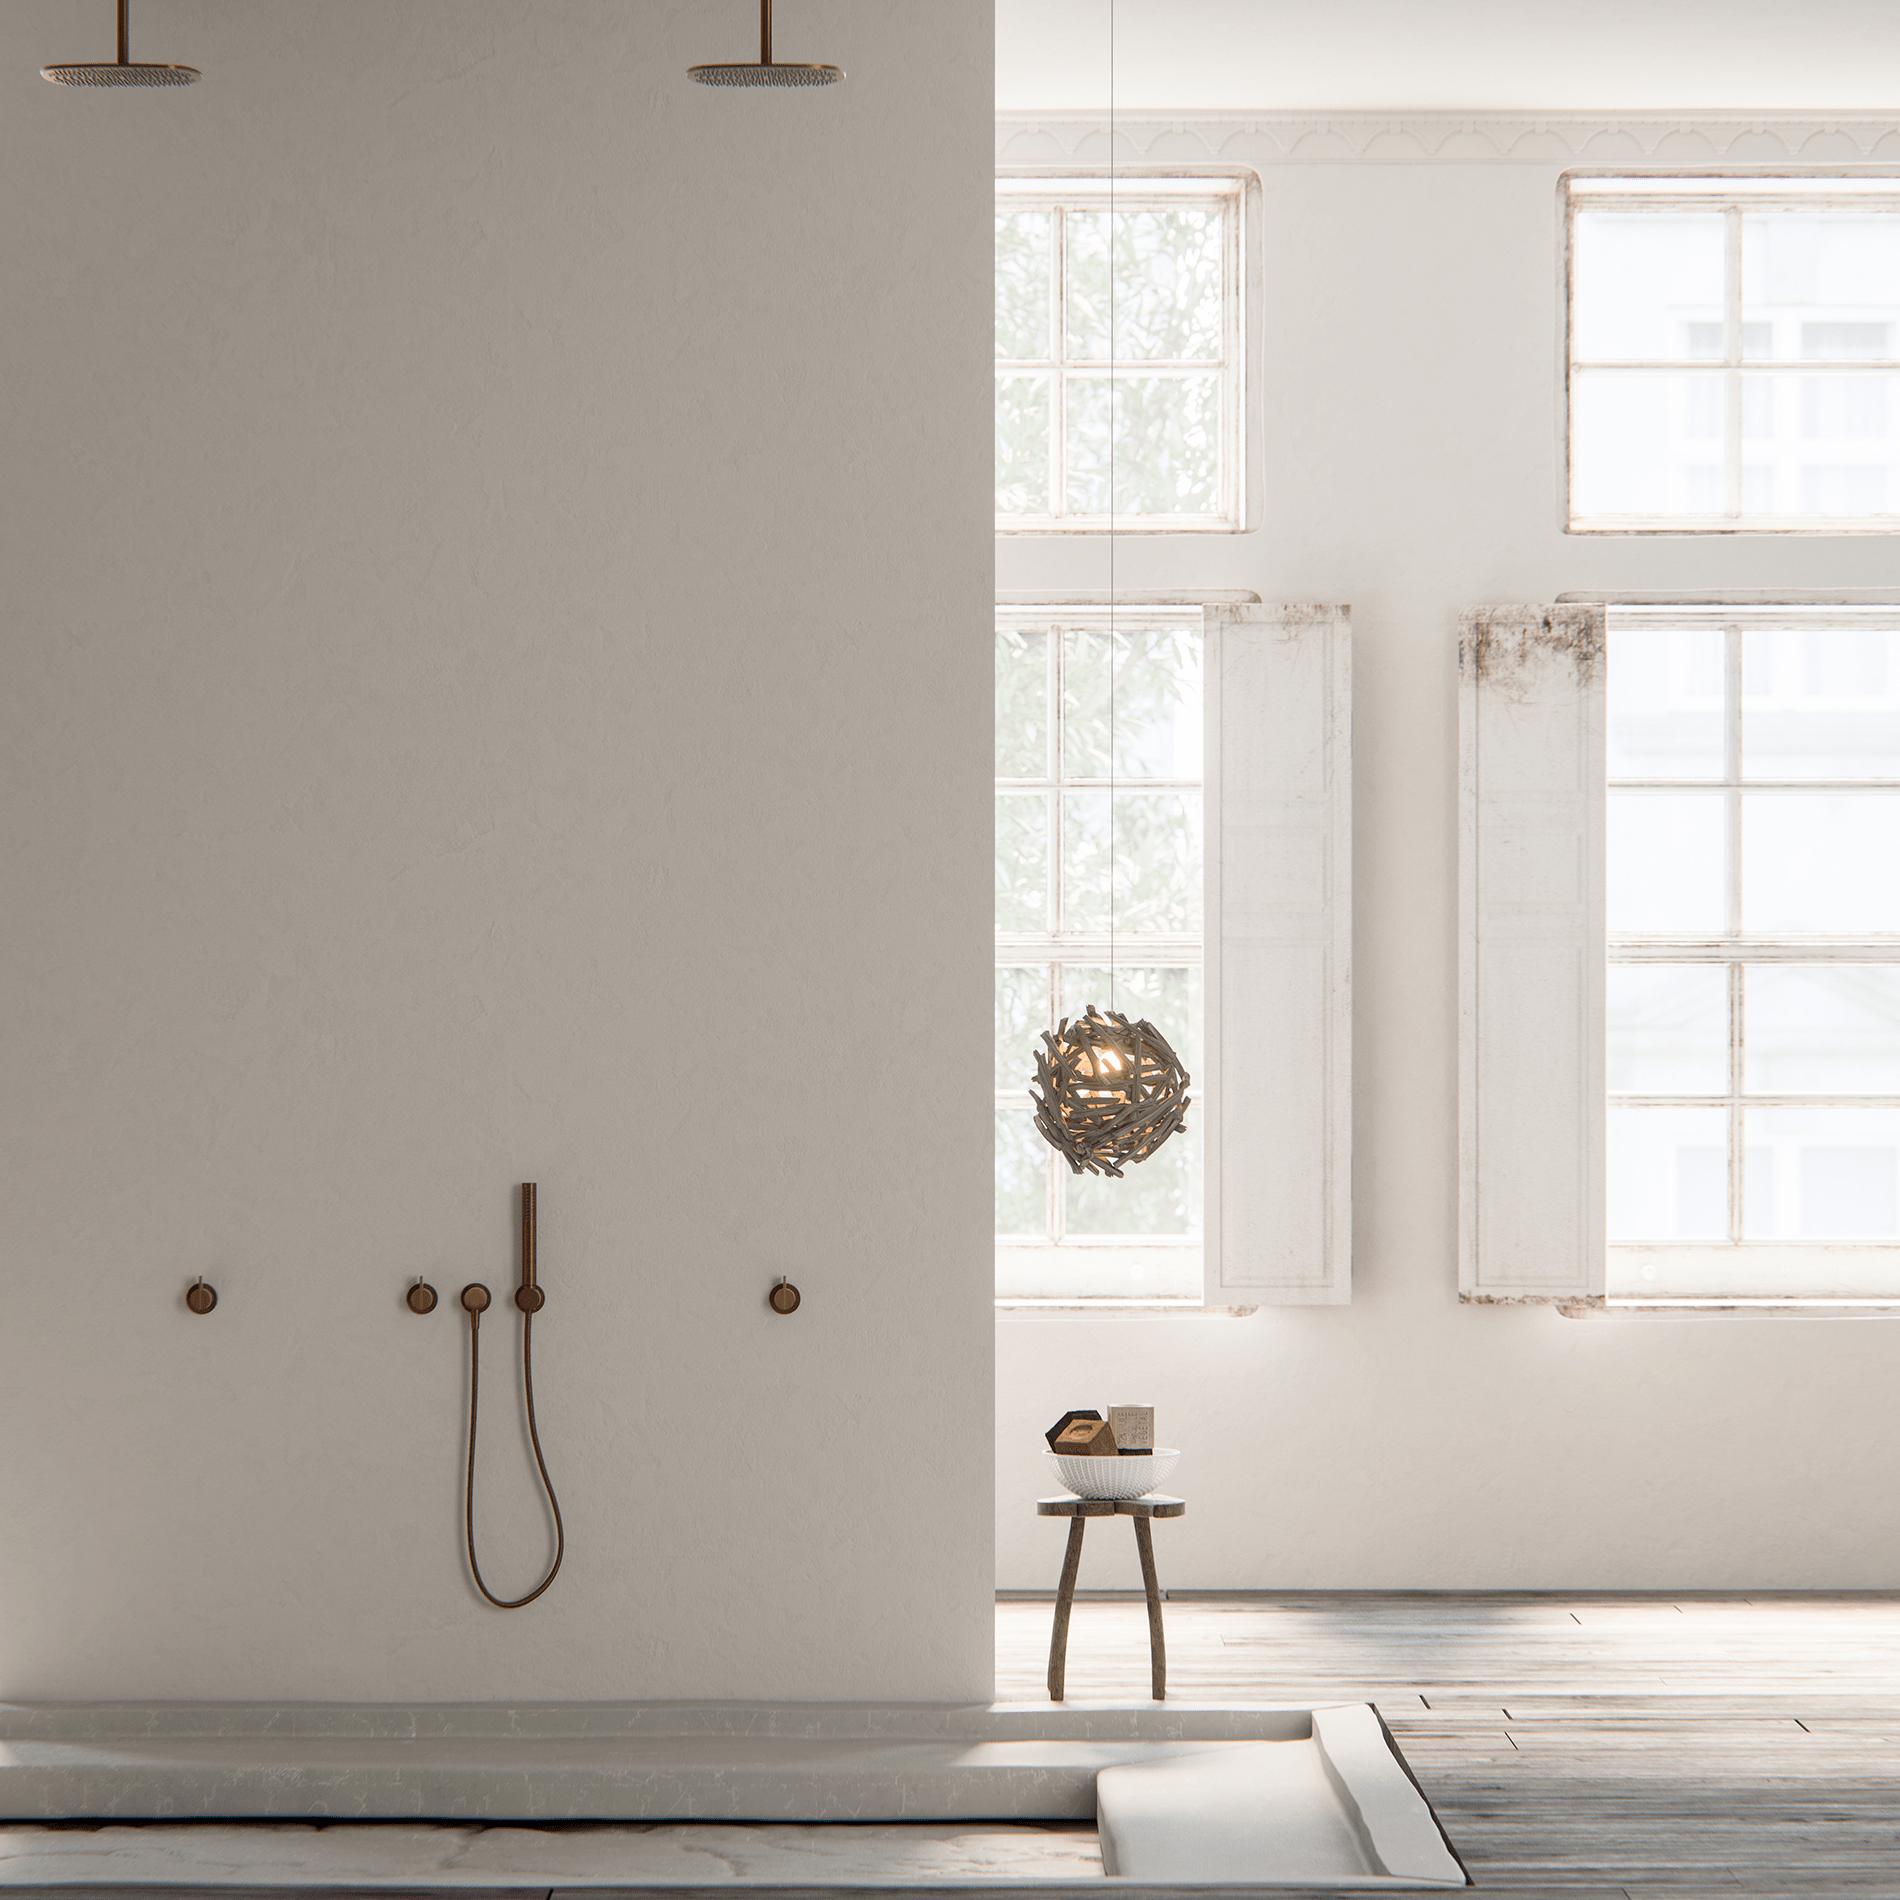 10 x 6 badezimmerdesigns berlin  loft in   bathrooms  pinterest  bathroom minimalist